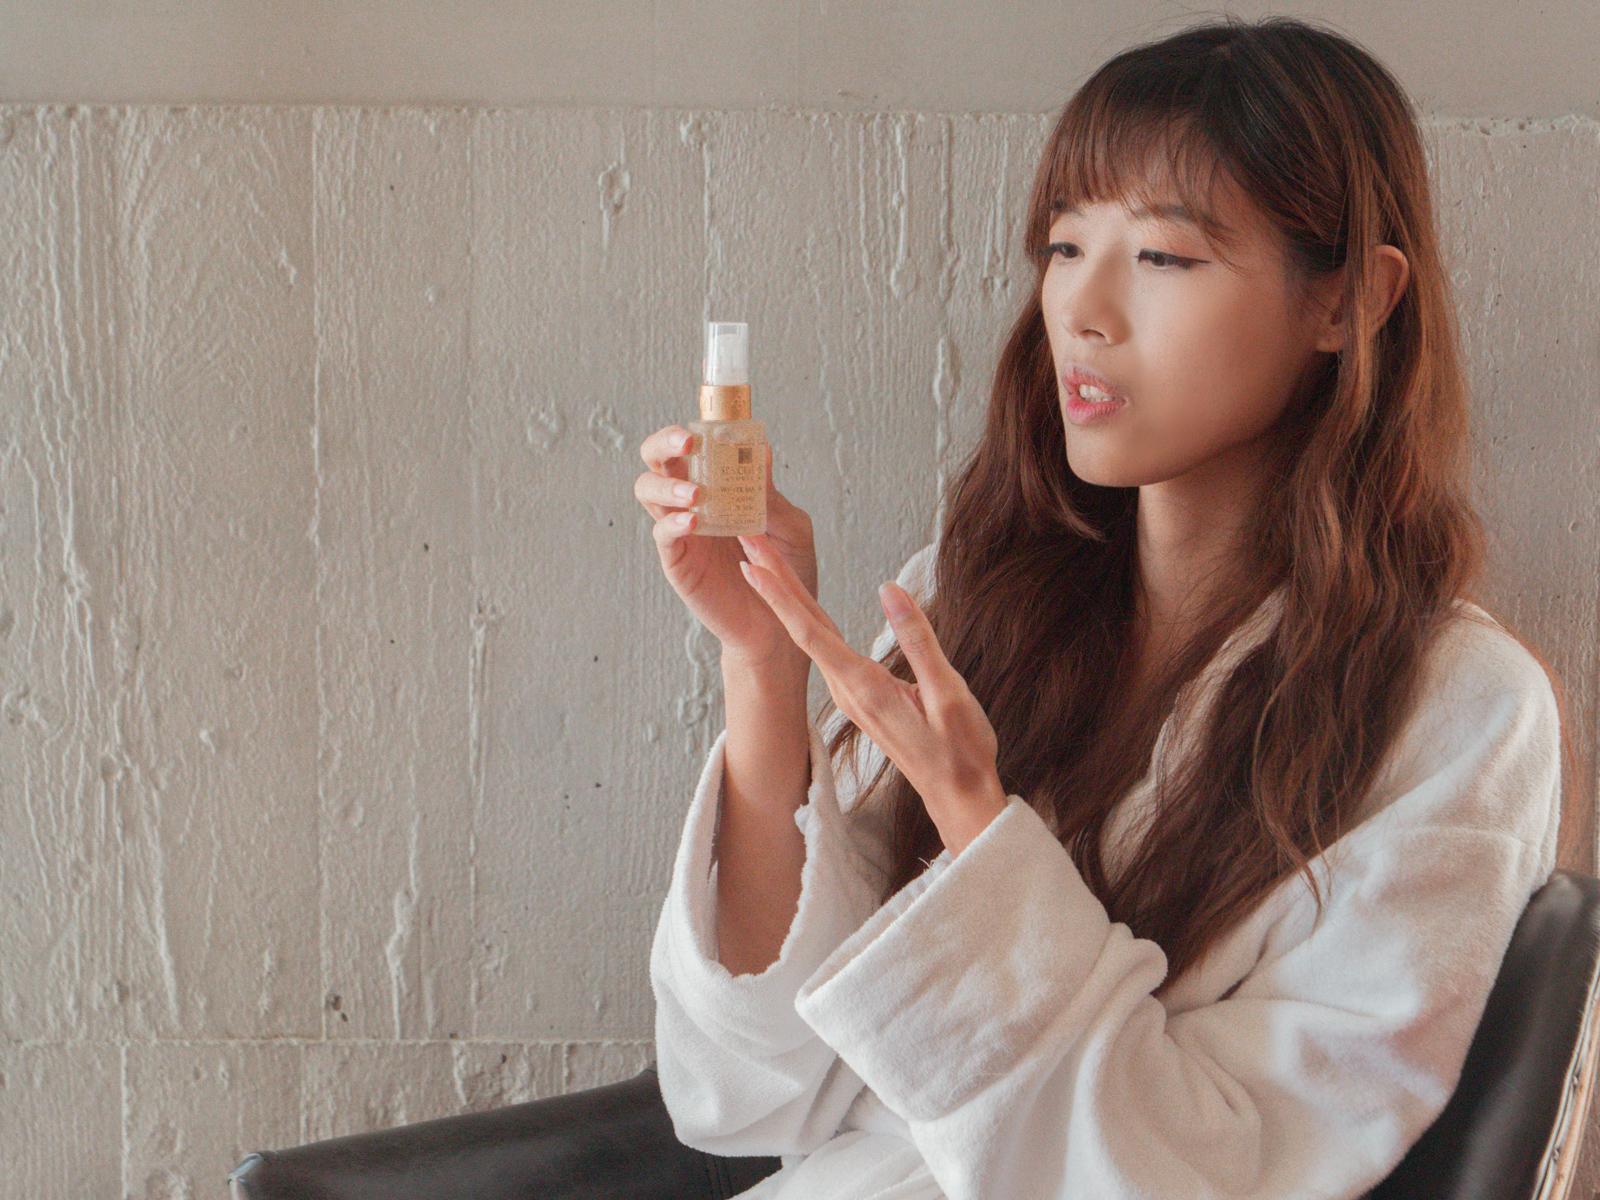 Spa Ceylon 頂級臉部保養 100%純淨精油配方 斯里蘭卡皇室香調